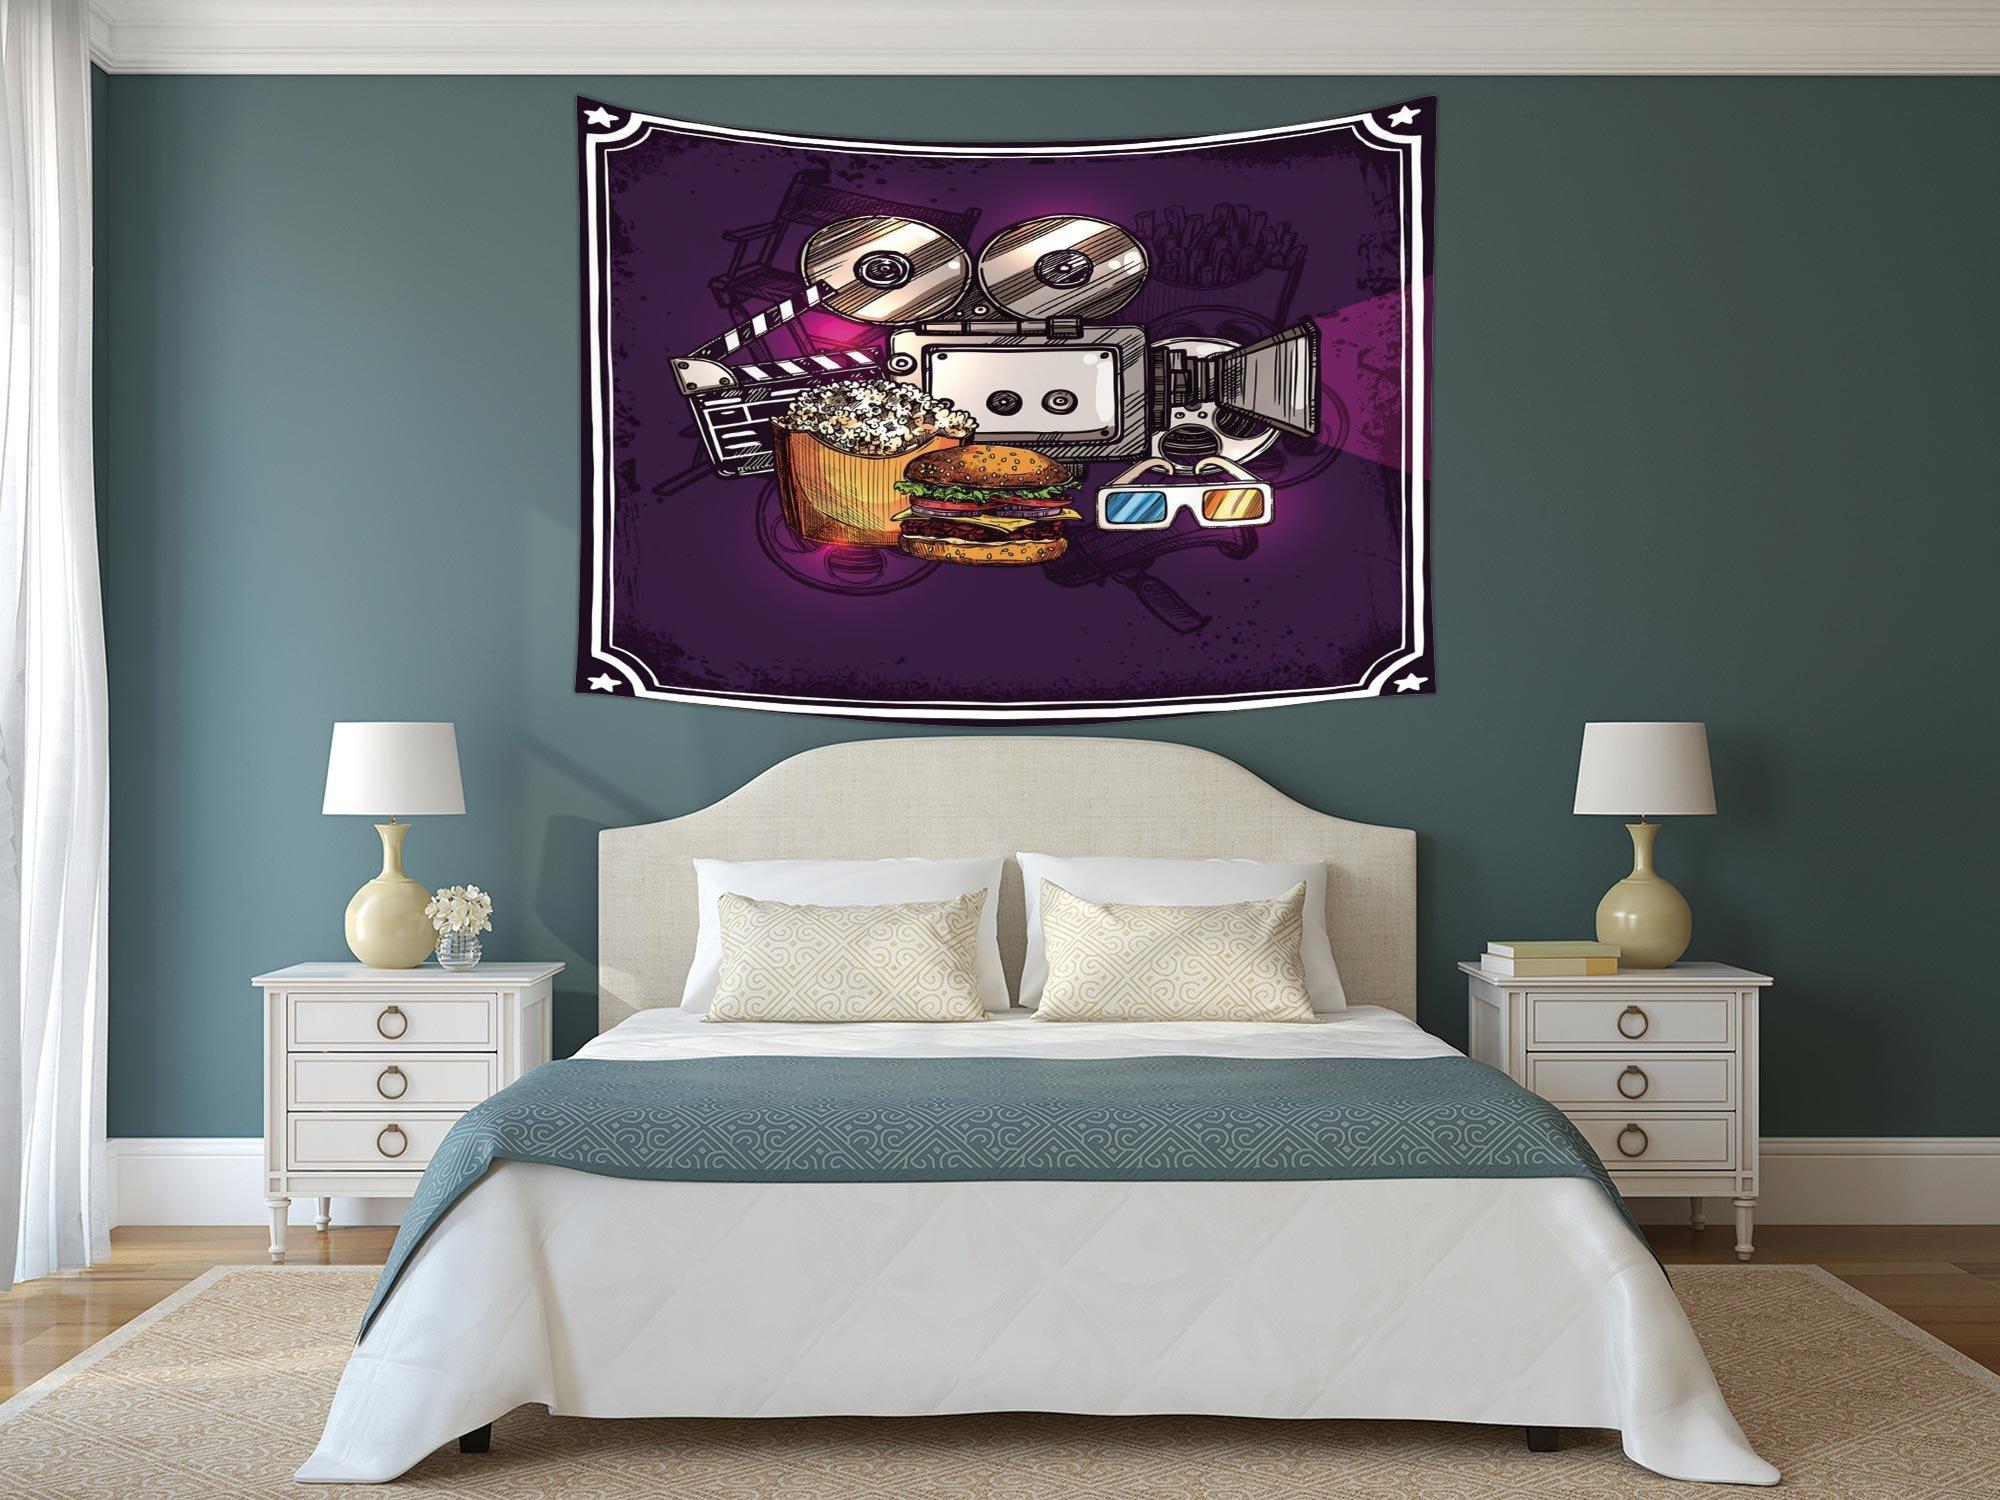 iPrint Polyester Tapestry Wall Hanging,Modern Decor,Cartoon like Cinema Movie Image Burgers Popcorns Glasses Art Print,Plum,Wall Decor for Bedroom Living Room Dorm